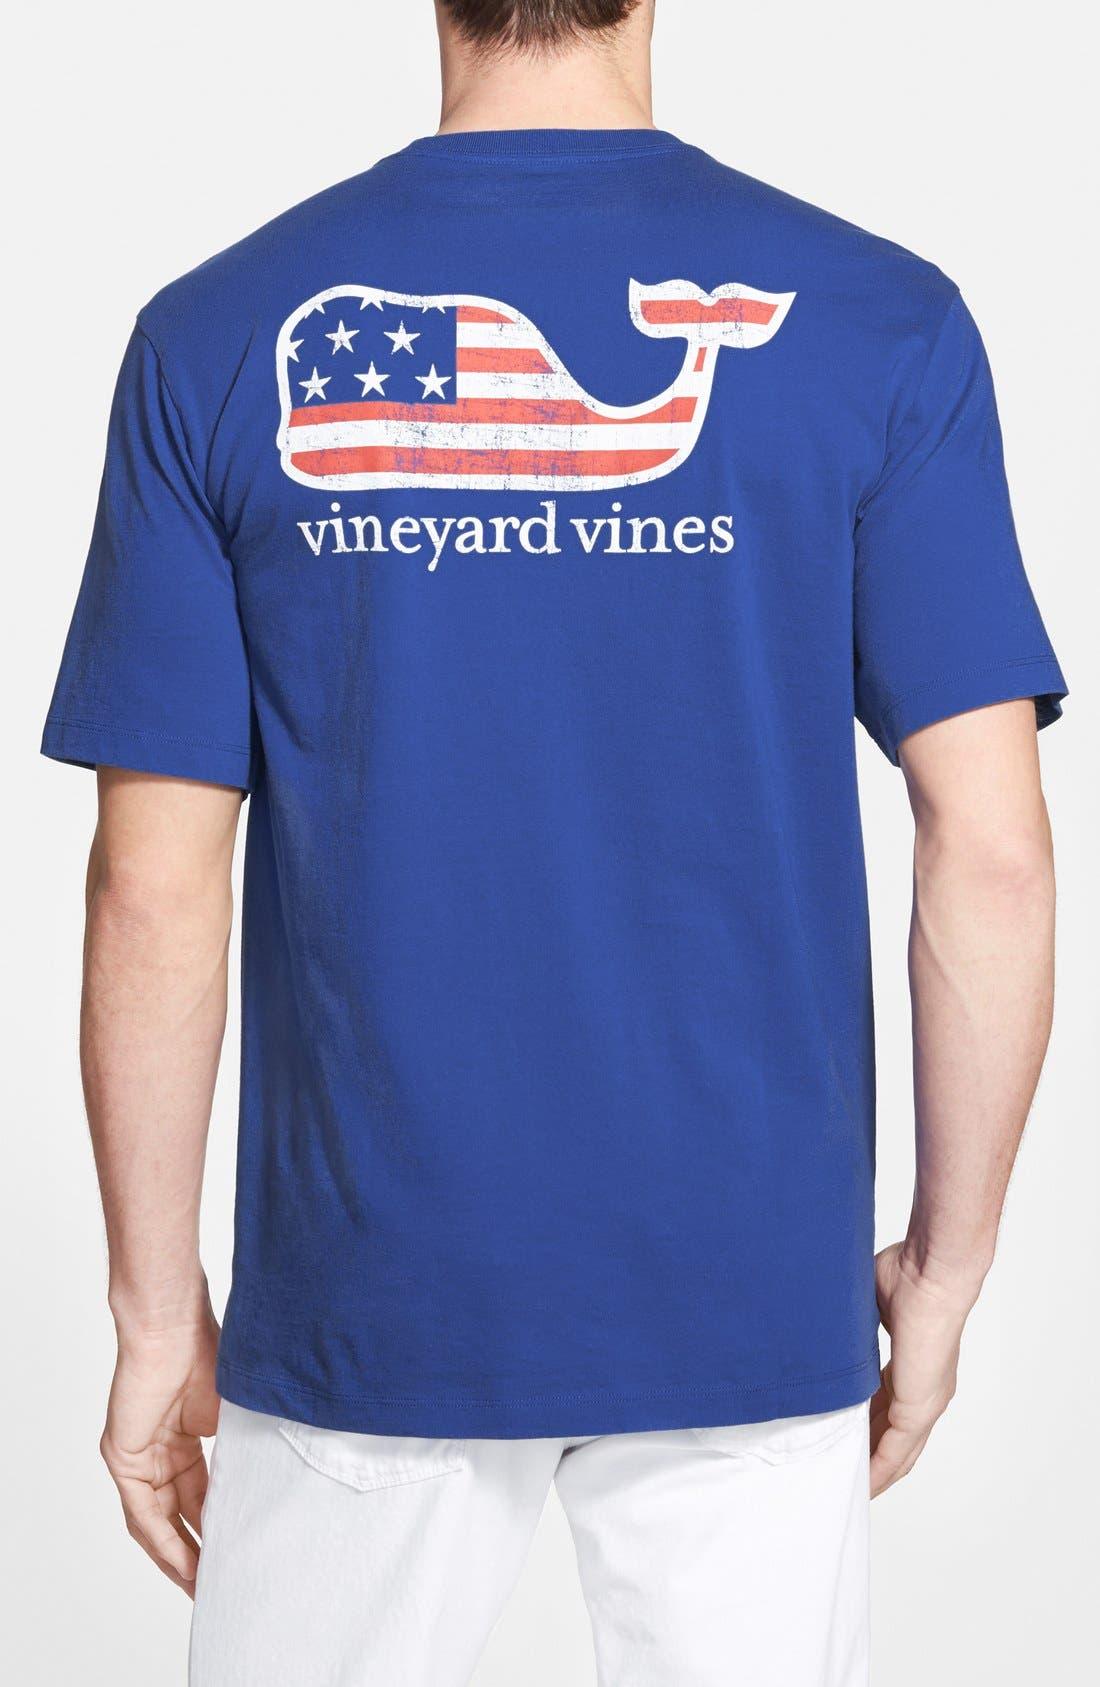 Main Image - Vineyard Vines 'American Flag Whale' Graphic T-Shirt